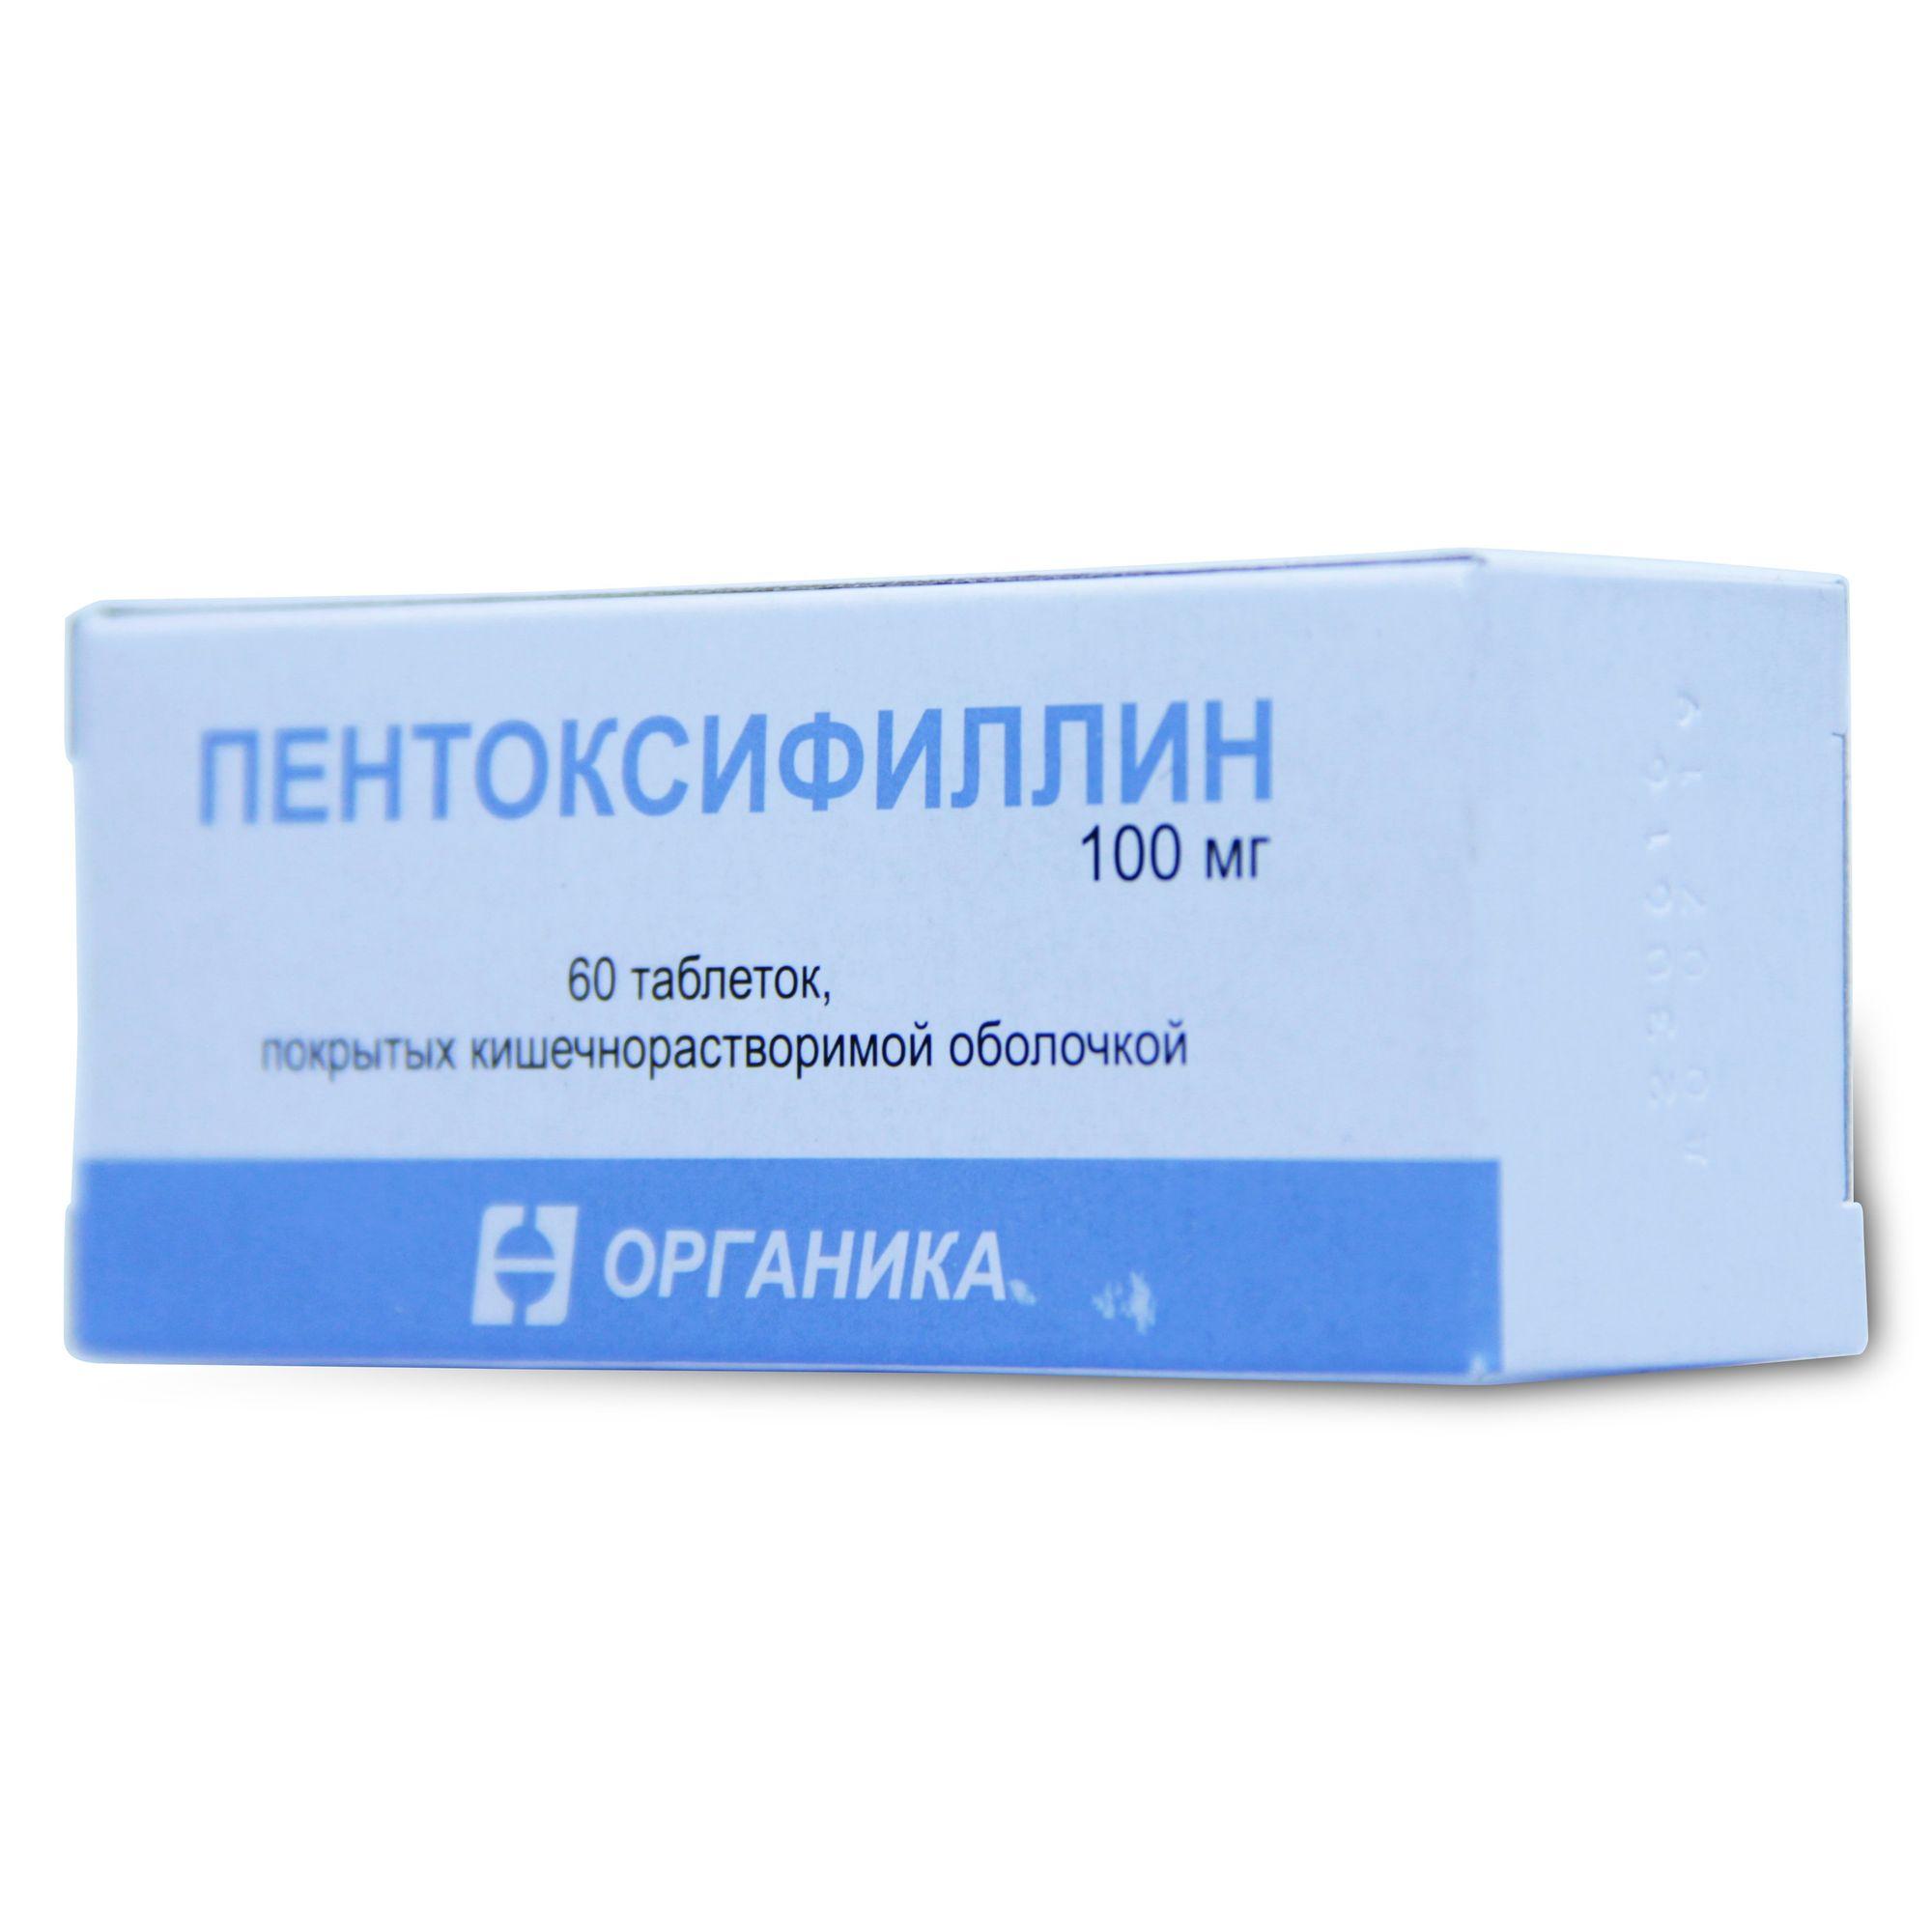 фото упаковки Пентоксифиллин